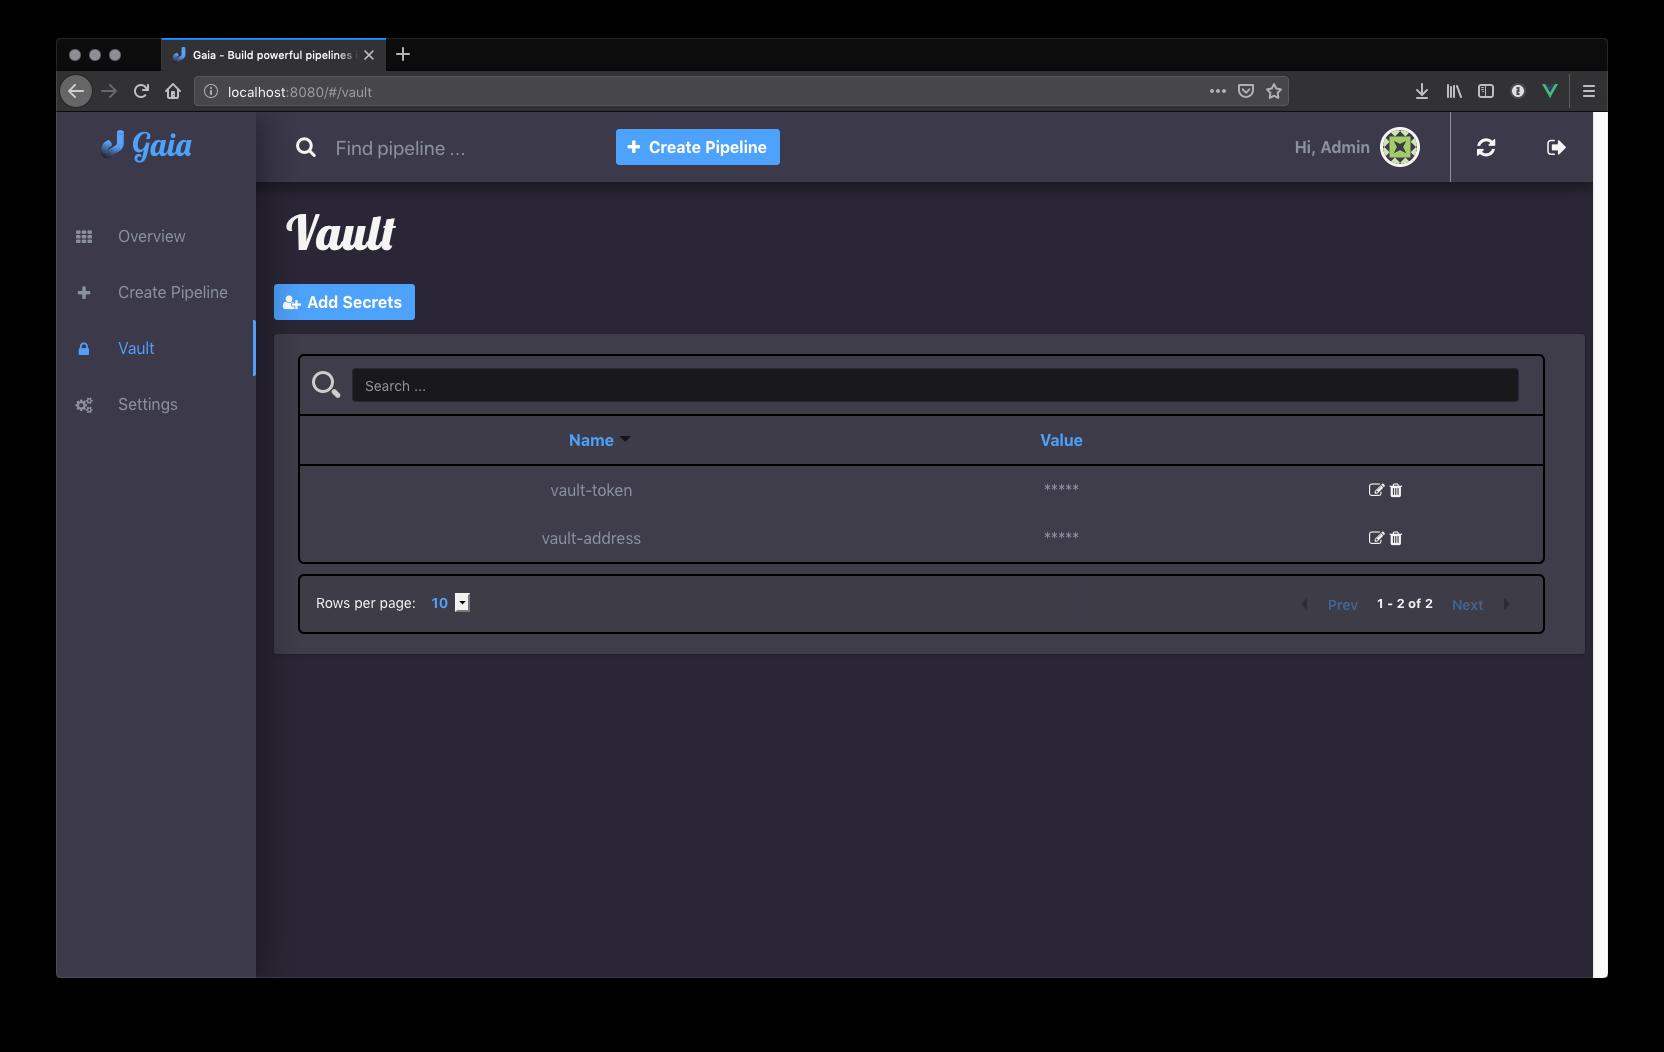 gaia Vault screenshot